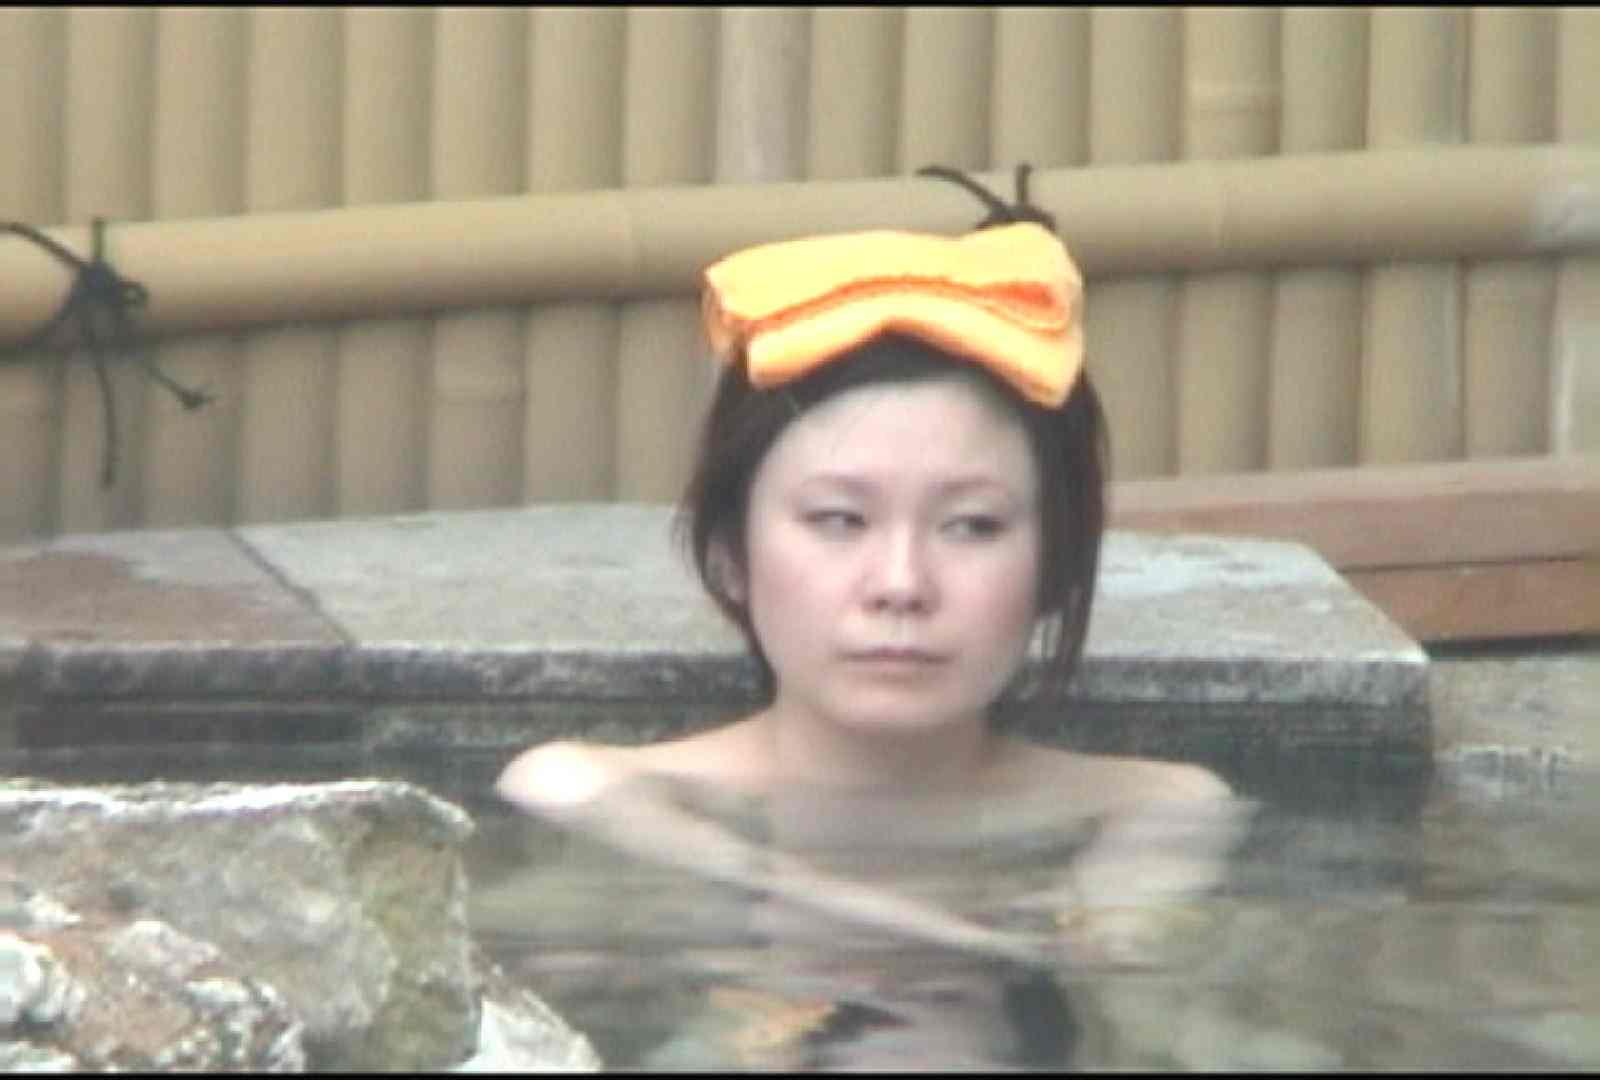 Aquaな露天風呂Vol.177 綺麗なOLたち アダルト動画キャプチャ 112枚 56